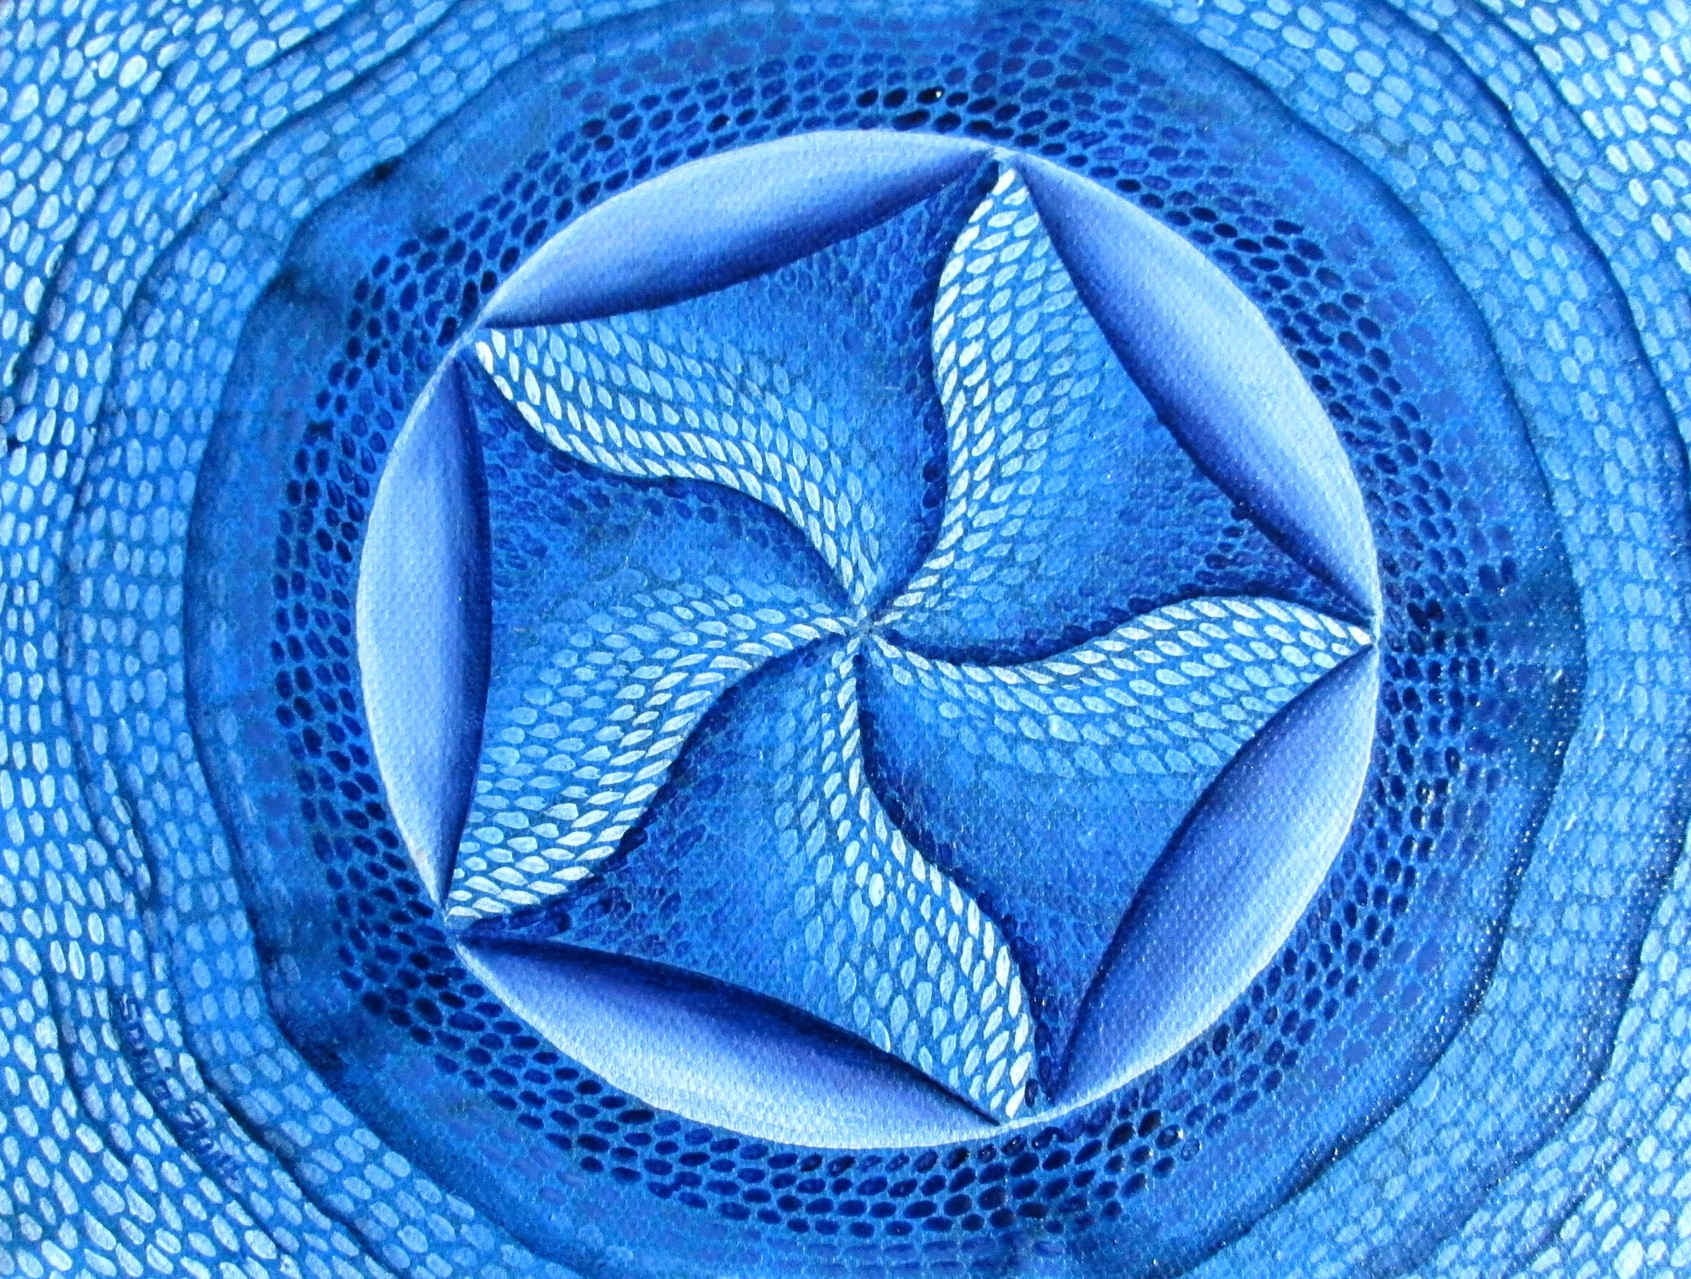 Blue Mandala doodle II, oil on cradled wood board 6x8, Sept.2014